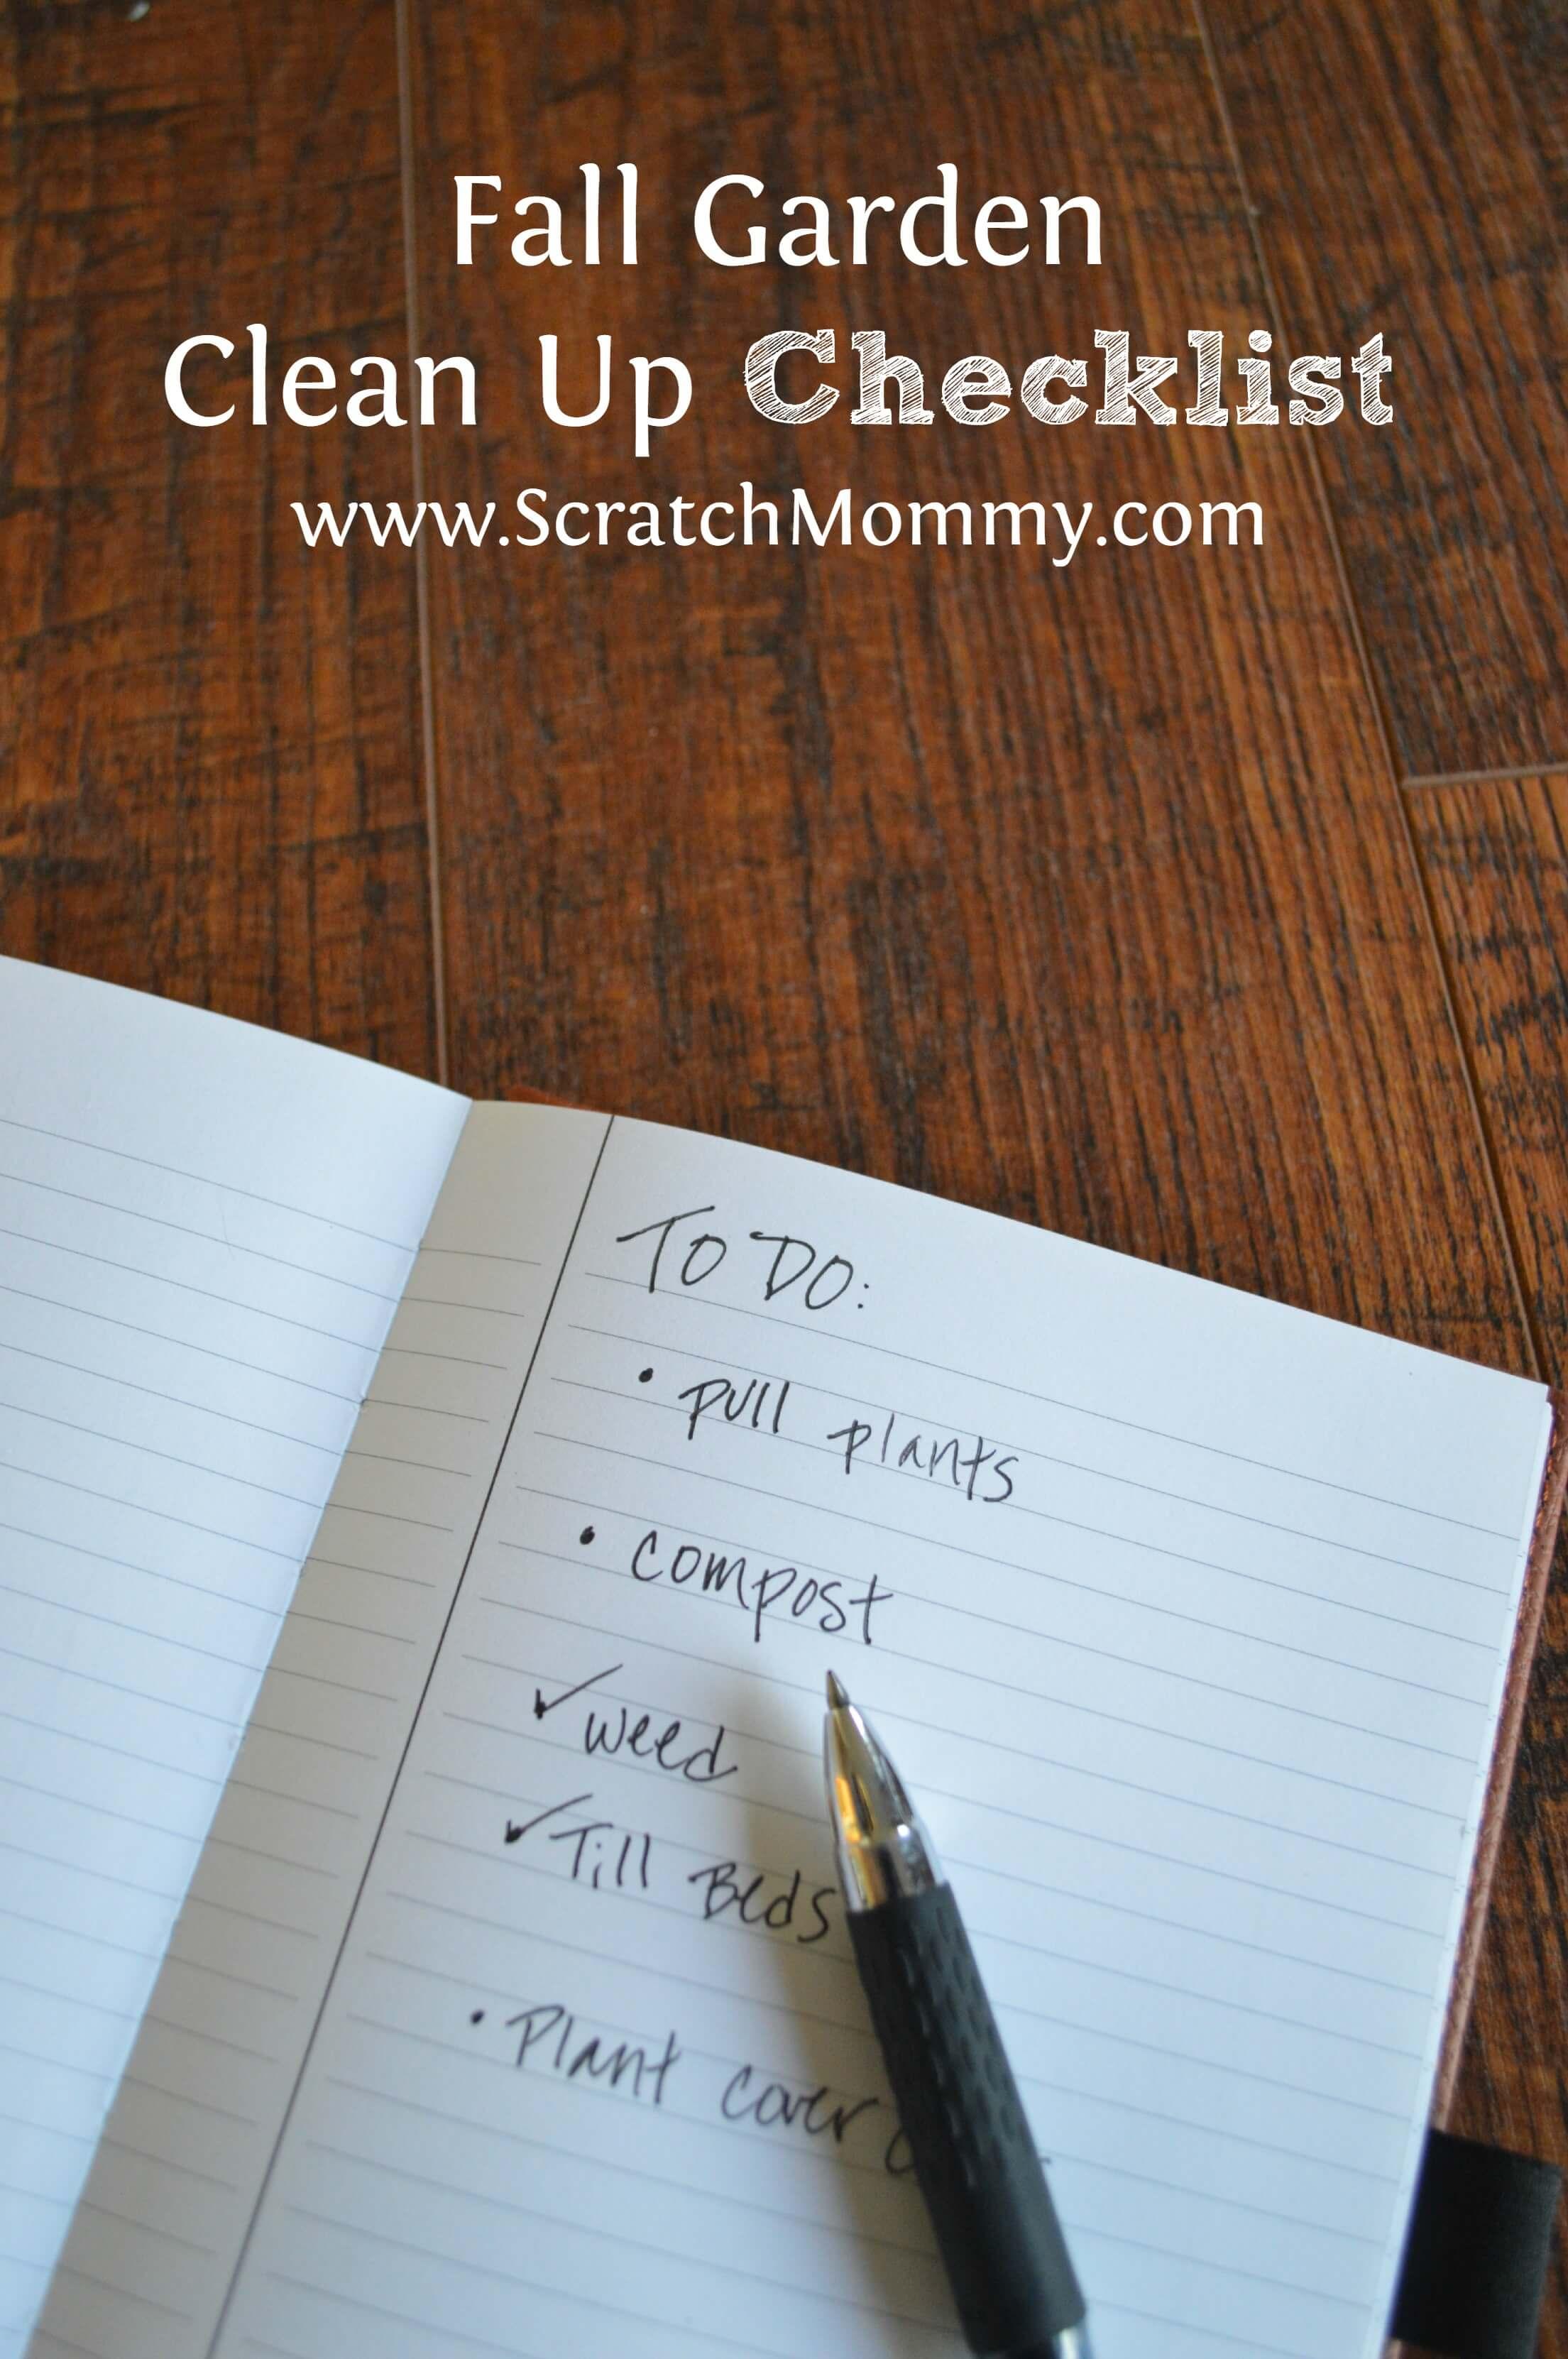 Fall Garden Clean up checklist